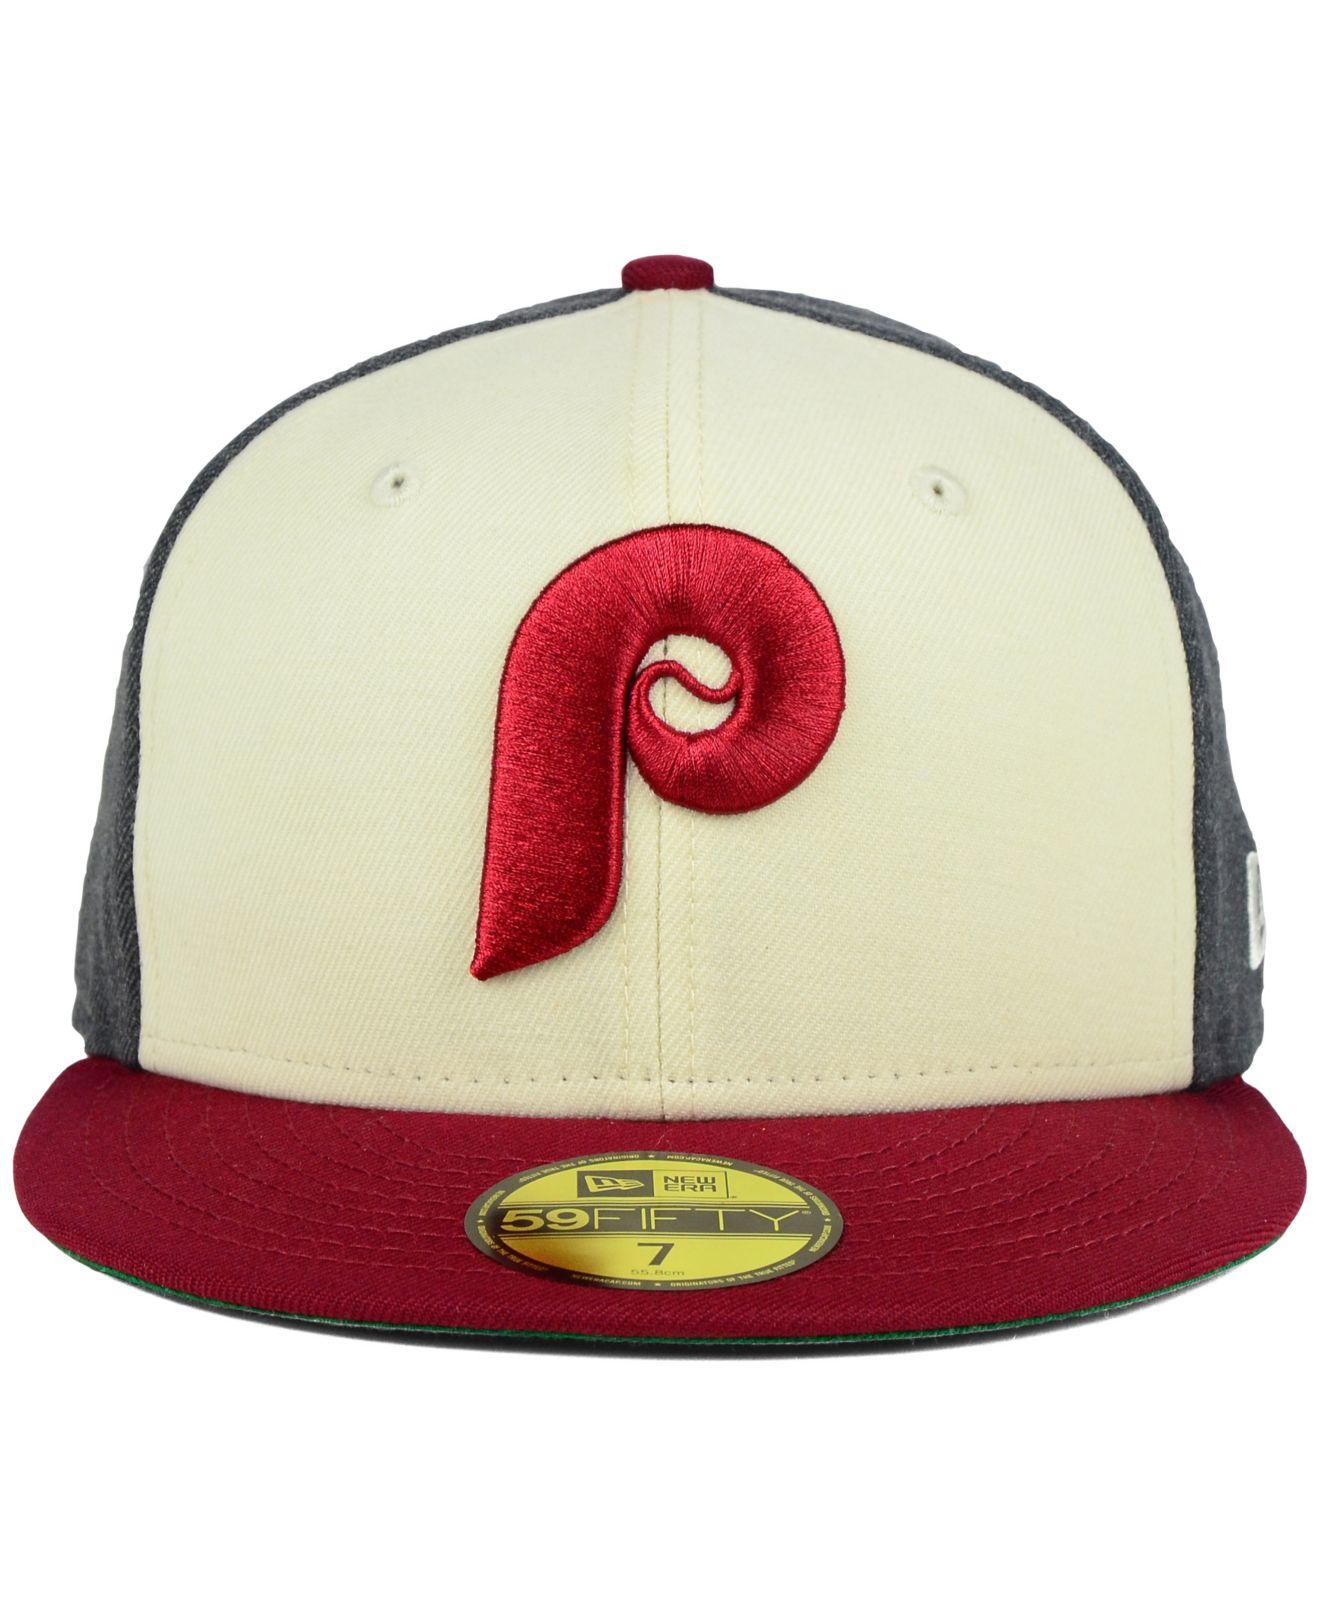 5c397ebe KTZ Philadelphia Phillies Classic Coop 59fifty Cap in Red for Men - Lyst